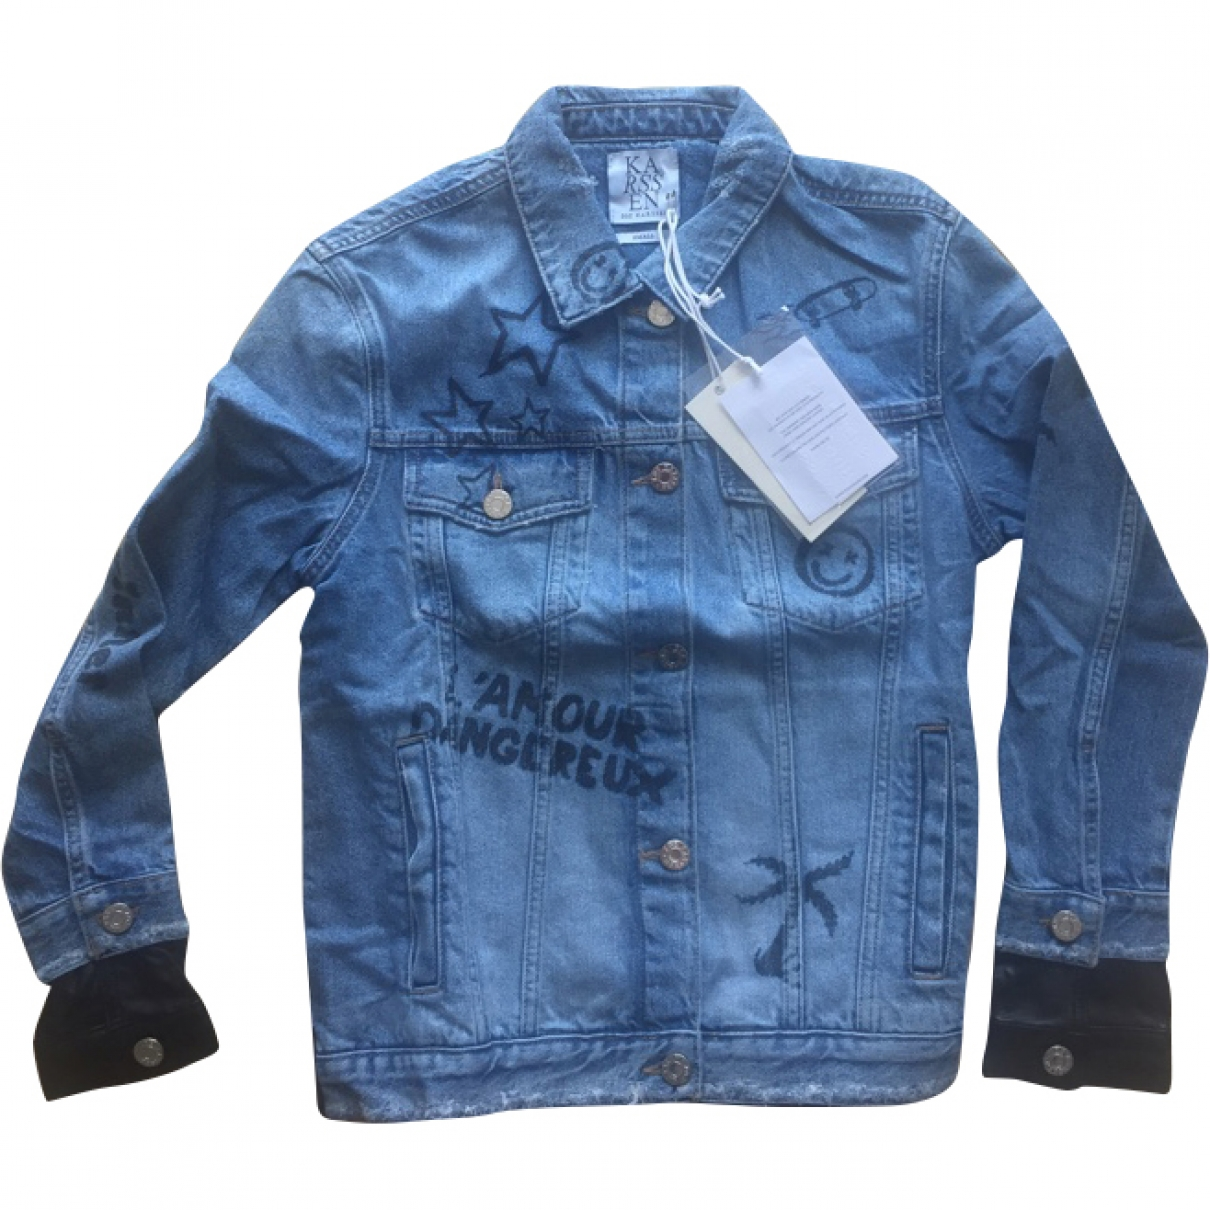 Zoe Karssen \N Jacke in  Blau Denim - Jeans